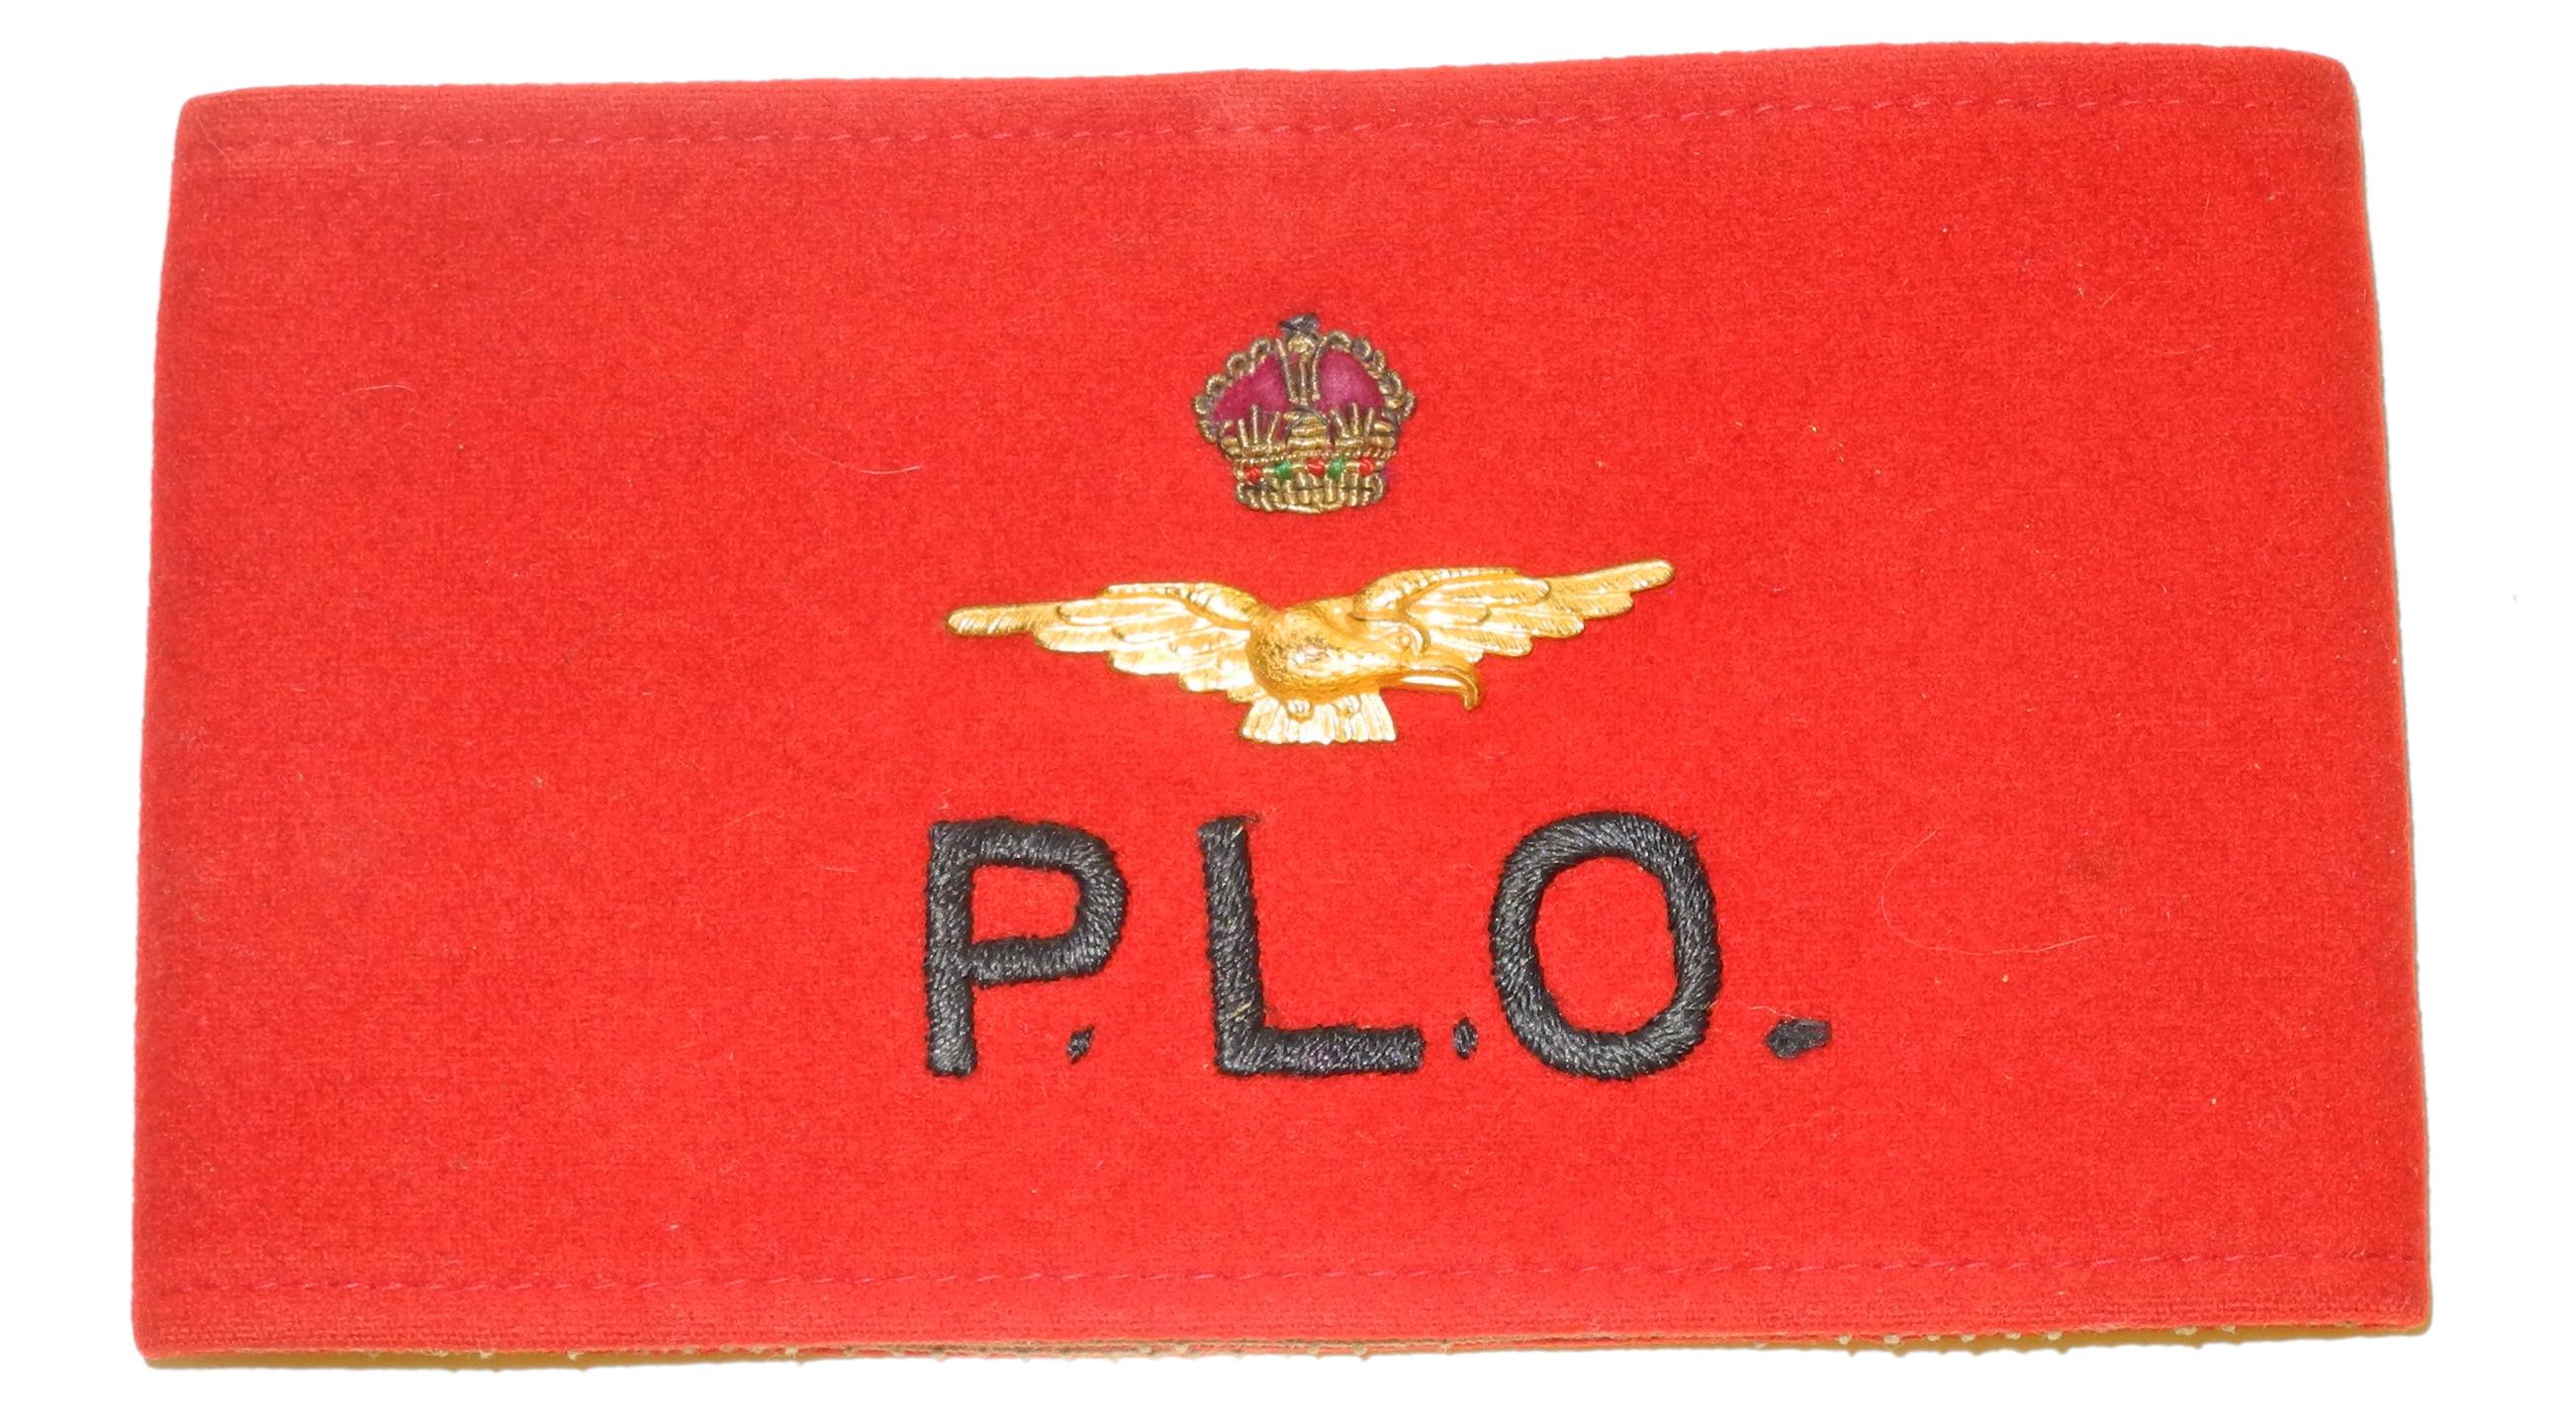 RAF/RCAF Pilot Liaison Officer armband